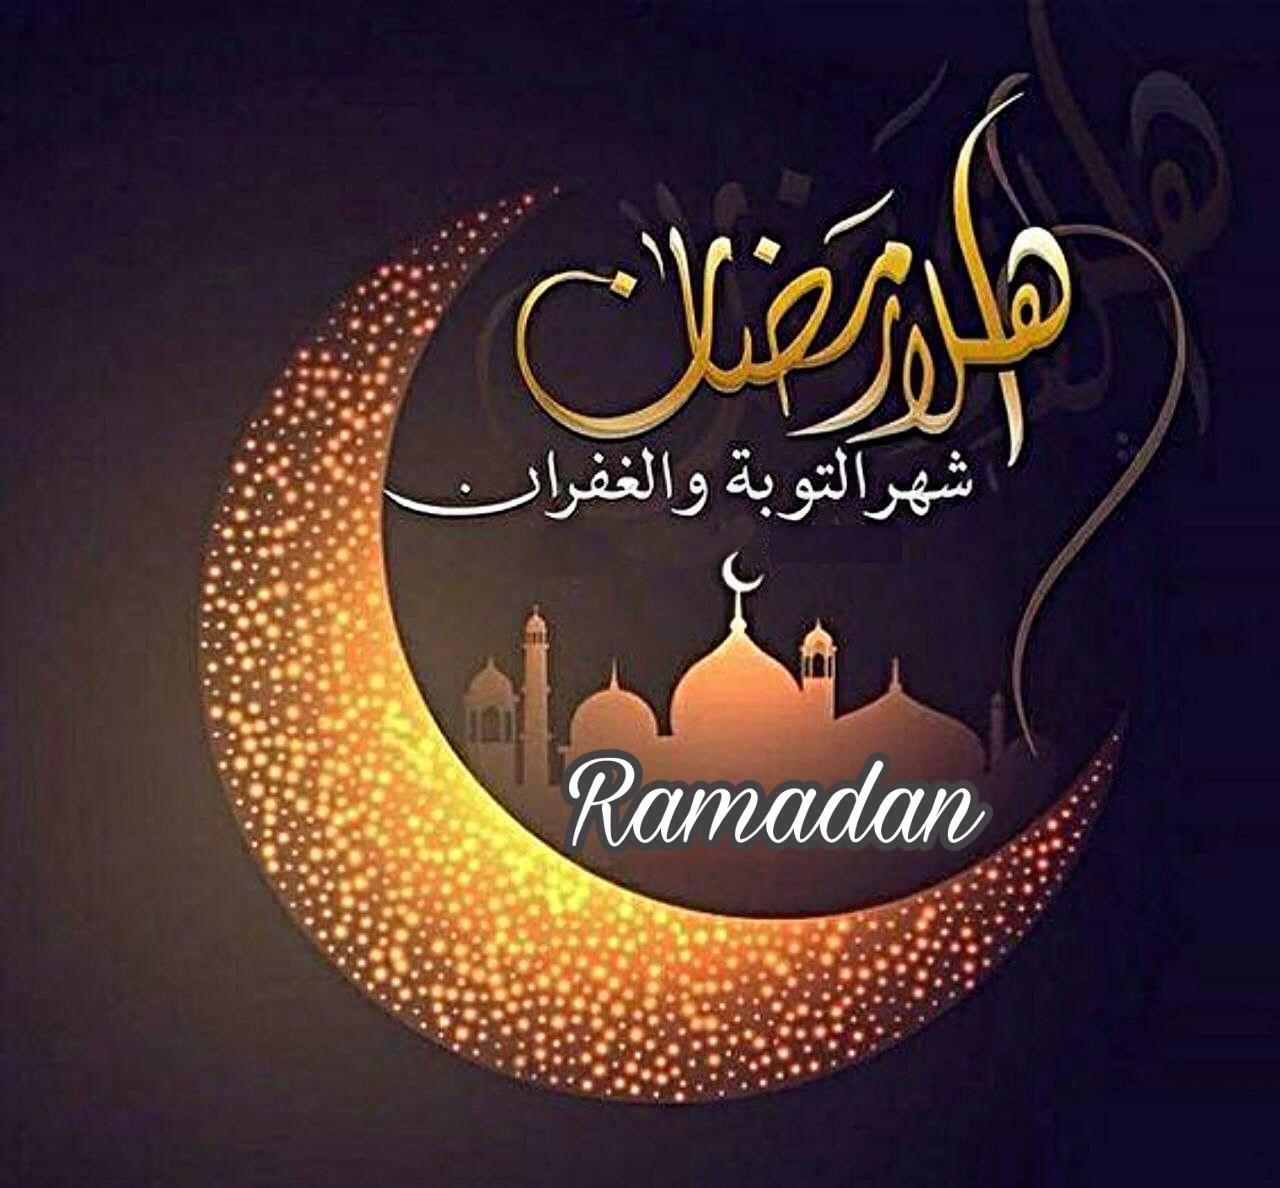 صورة اجمل ما قيل في رمضان , اروع كلام عن شهر رمضان 3749 1